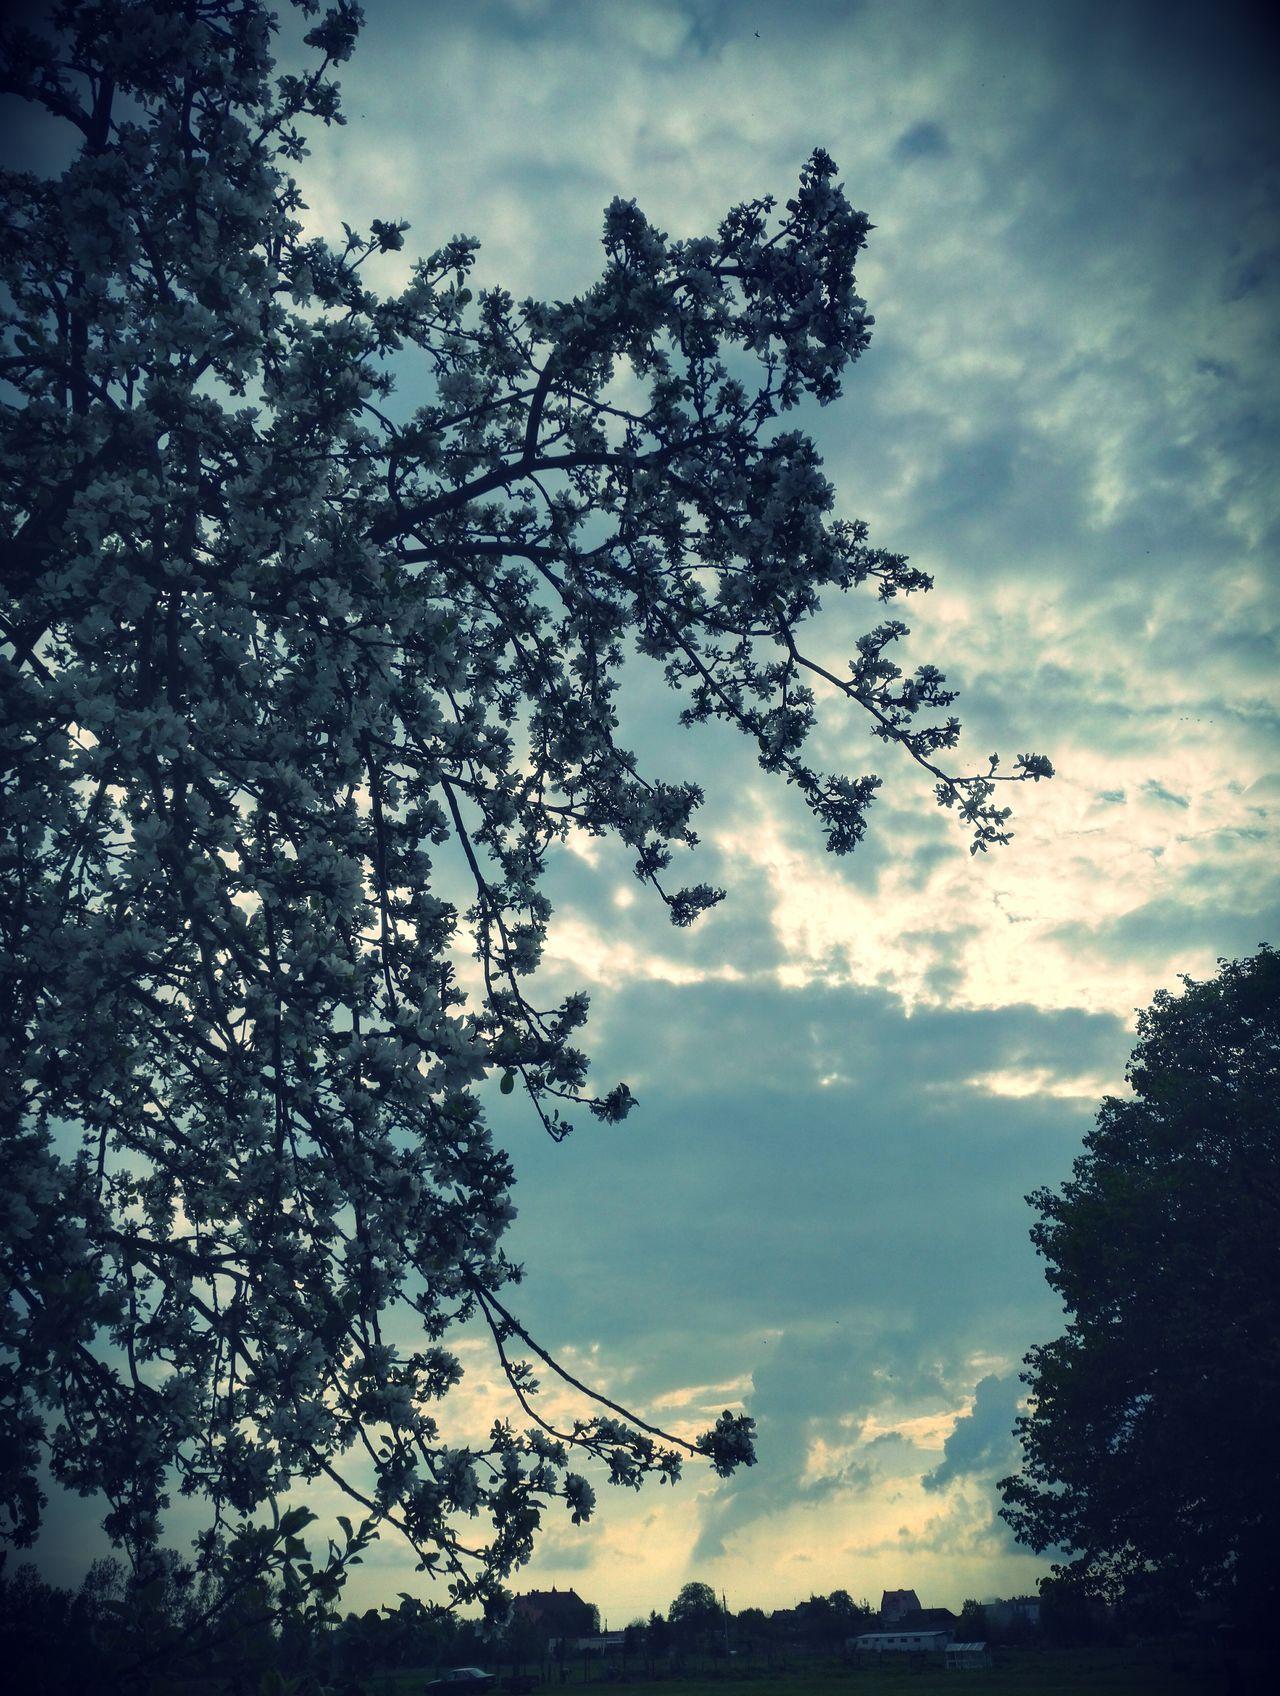 222. Tree Sky Cloud - Sky Low Angle View Forest Growth Scenics Storm Cloud Branch Himmel EyeEm Masterclass EyeEm Best Edits Eyeem Photography EyeEmBestPics EyeEmbestshots EyeEmNewHere Telephone Photography Mobilephotography TreePorn Beauty In Nature Nature Outdoors EyeEm Best Shots No People Landscape